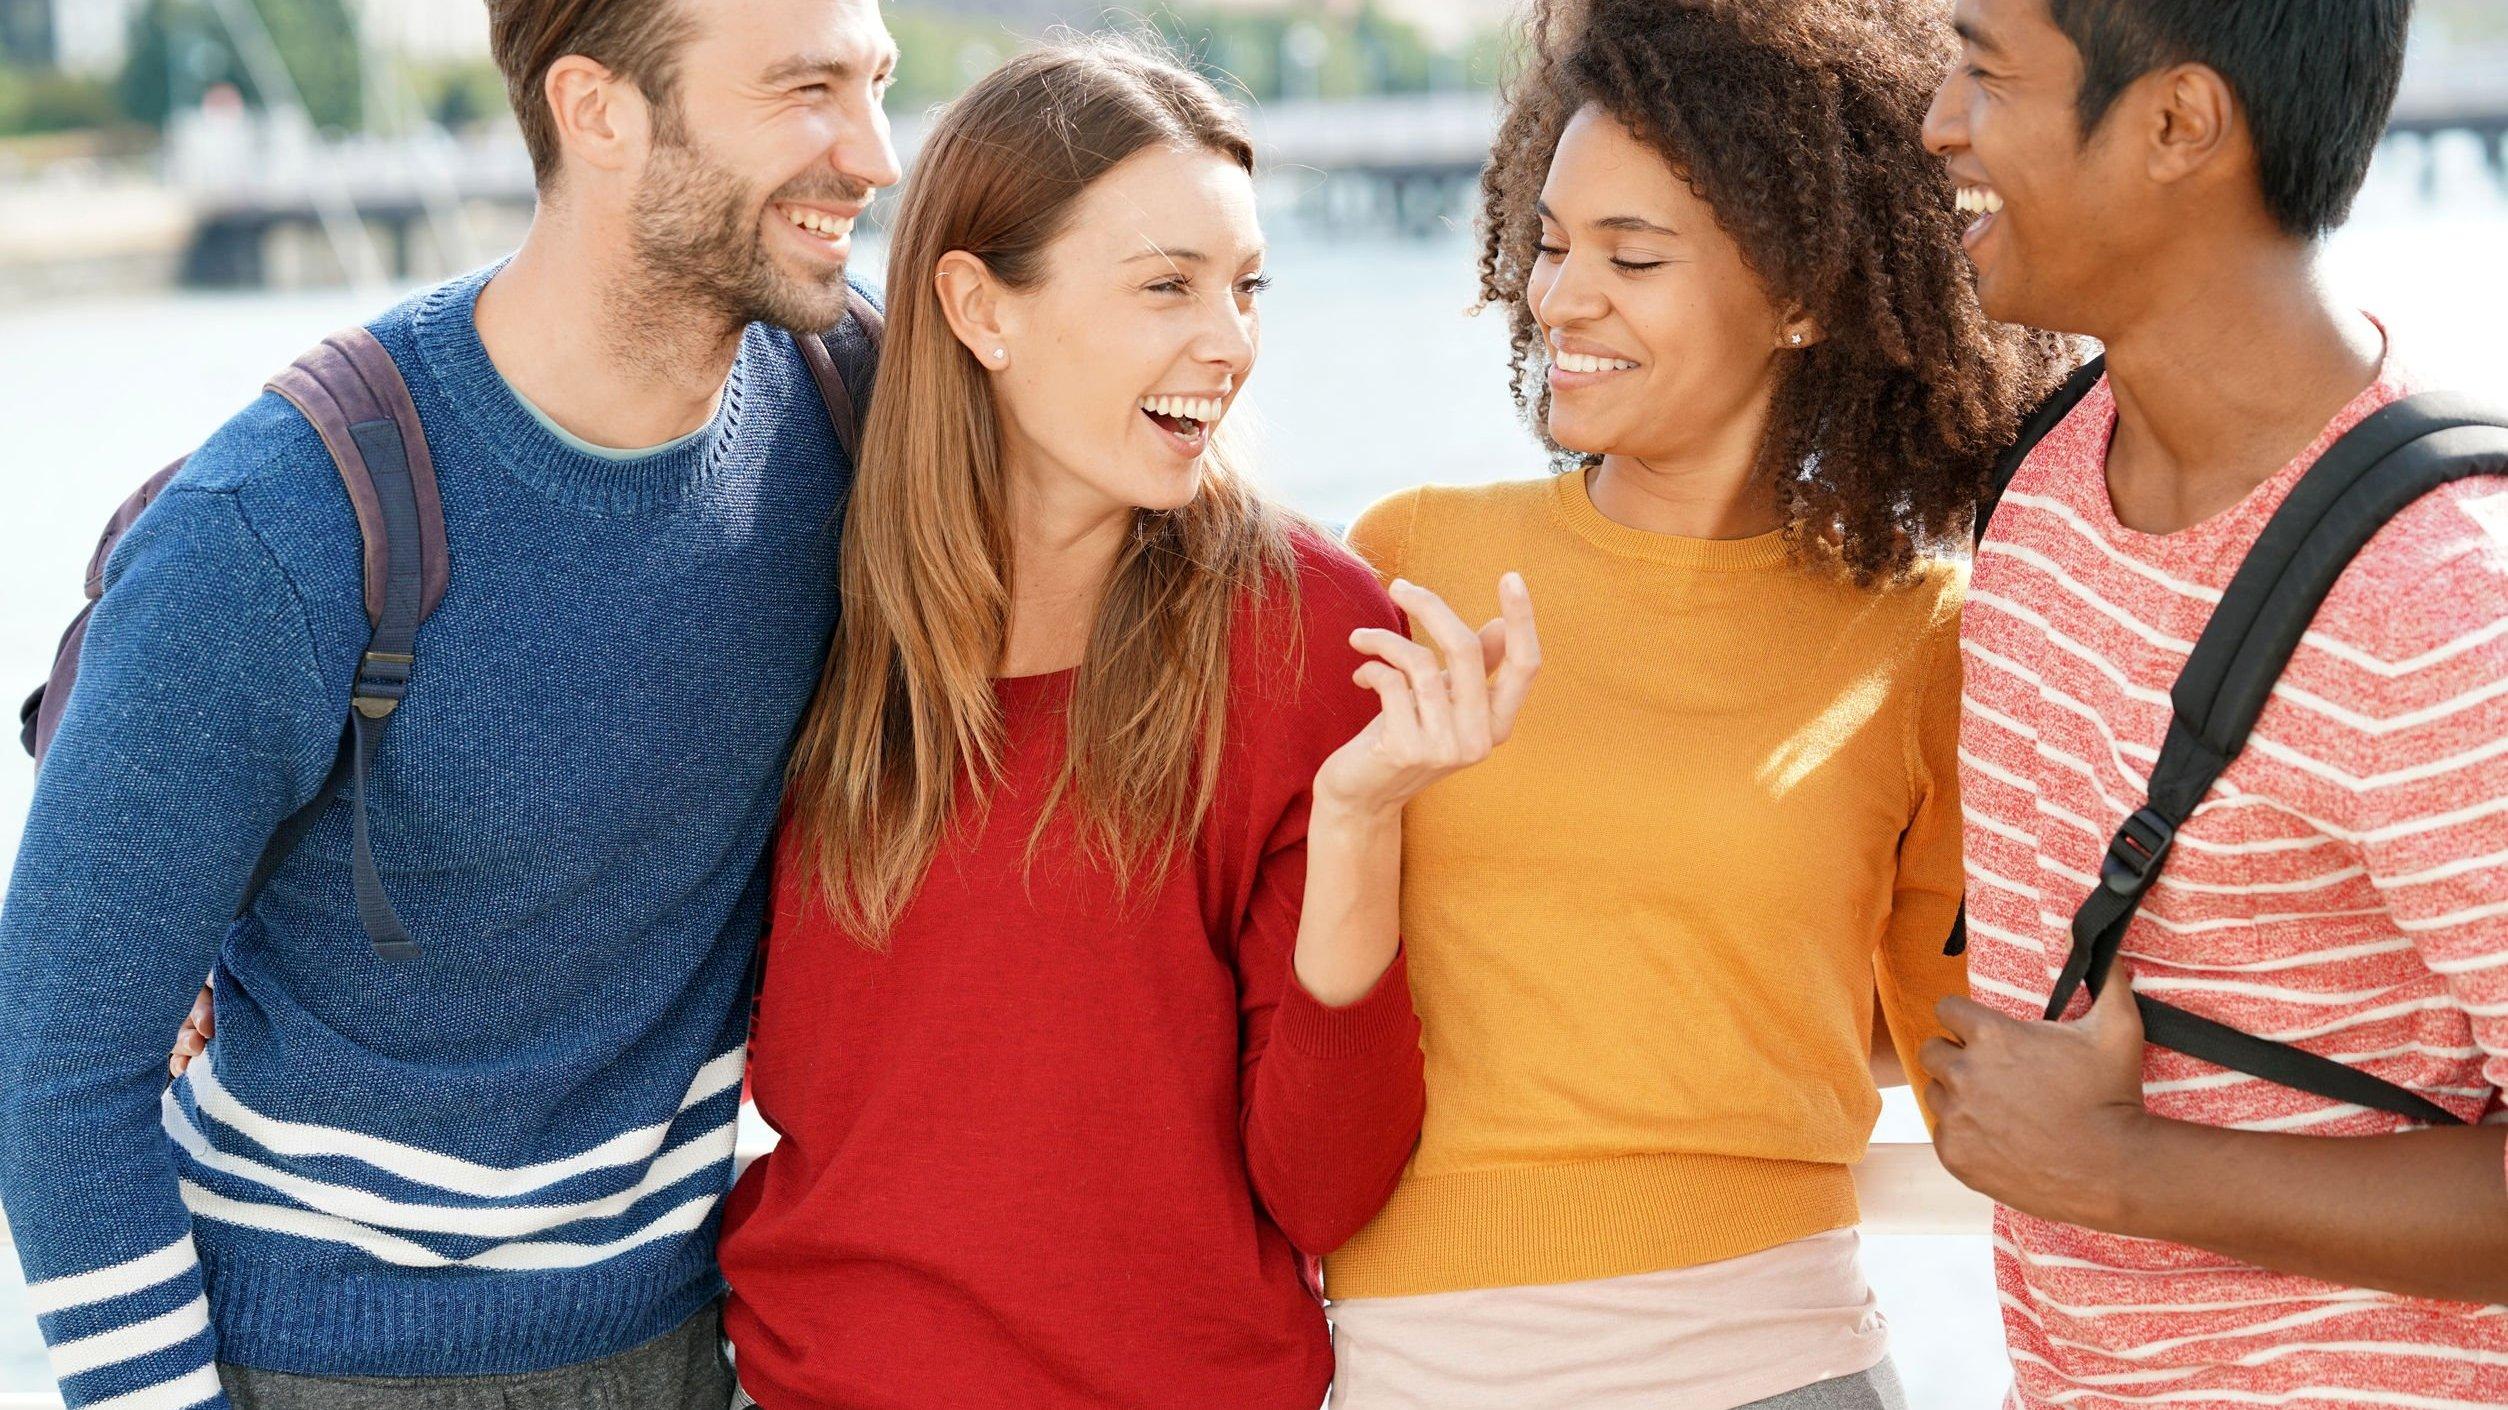 Grupo de amigos sorrindo, conversando.